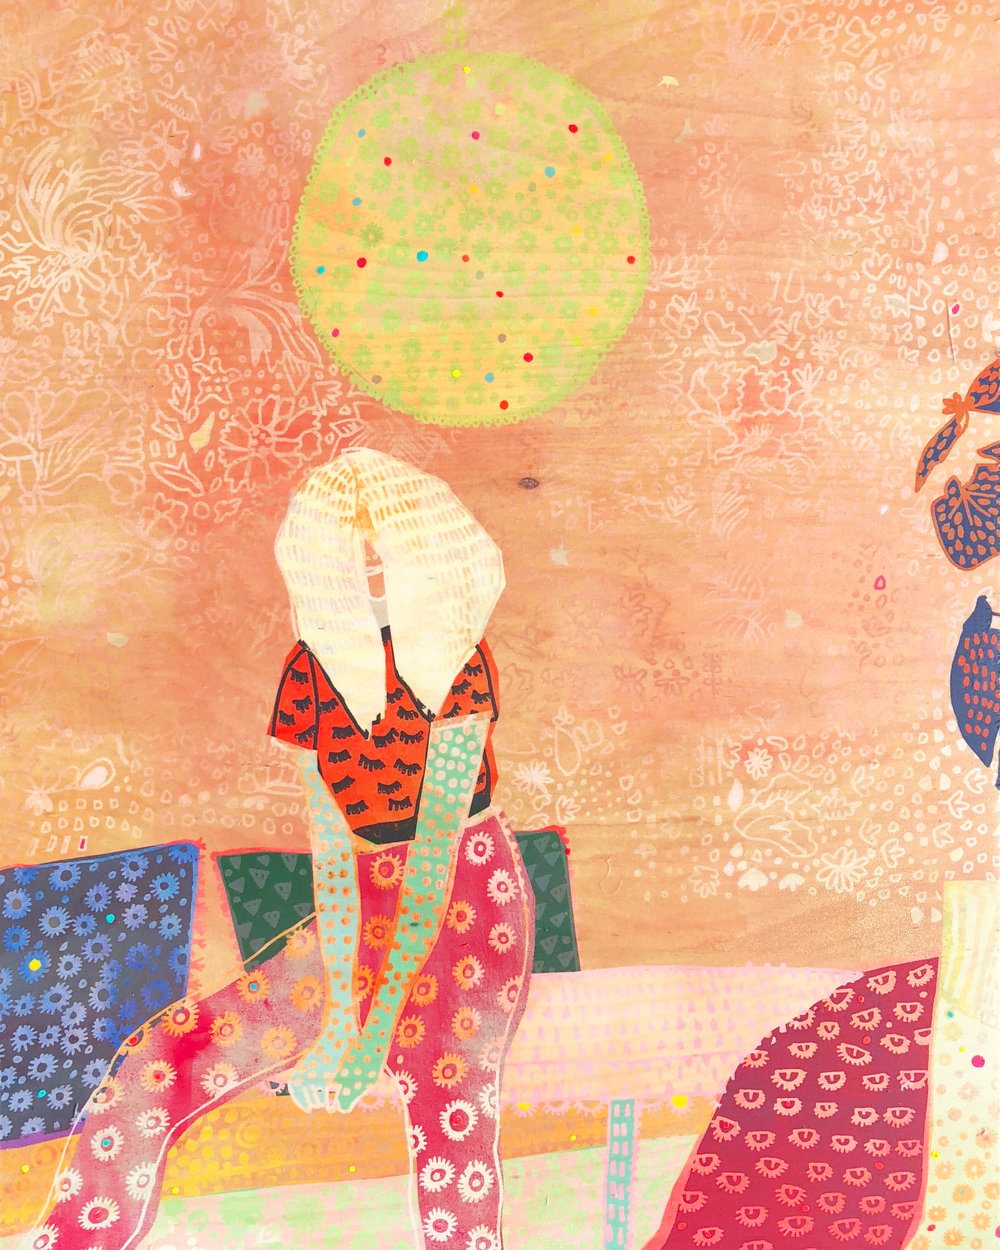 Emma Repp__Breakfast Crouch__ 18 x 24_Chiffon, Birch, Acrylic_$470.jpg